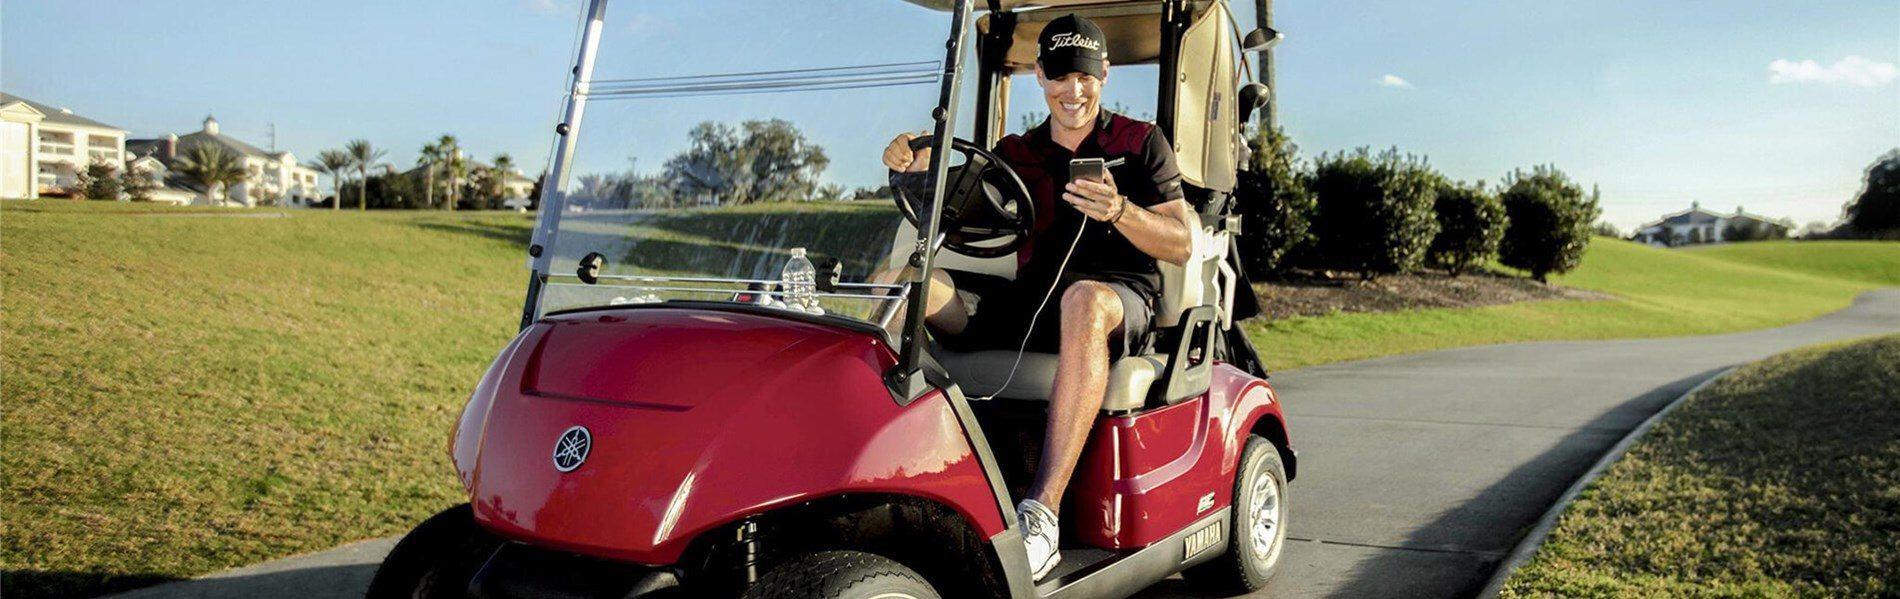 Woody Golf Cart Black on car cart, box cart, 2002 chrysler gem cart,